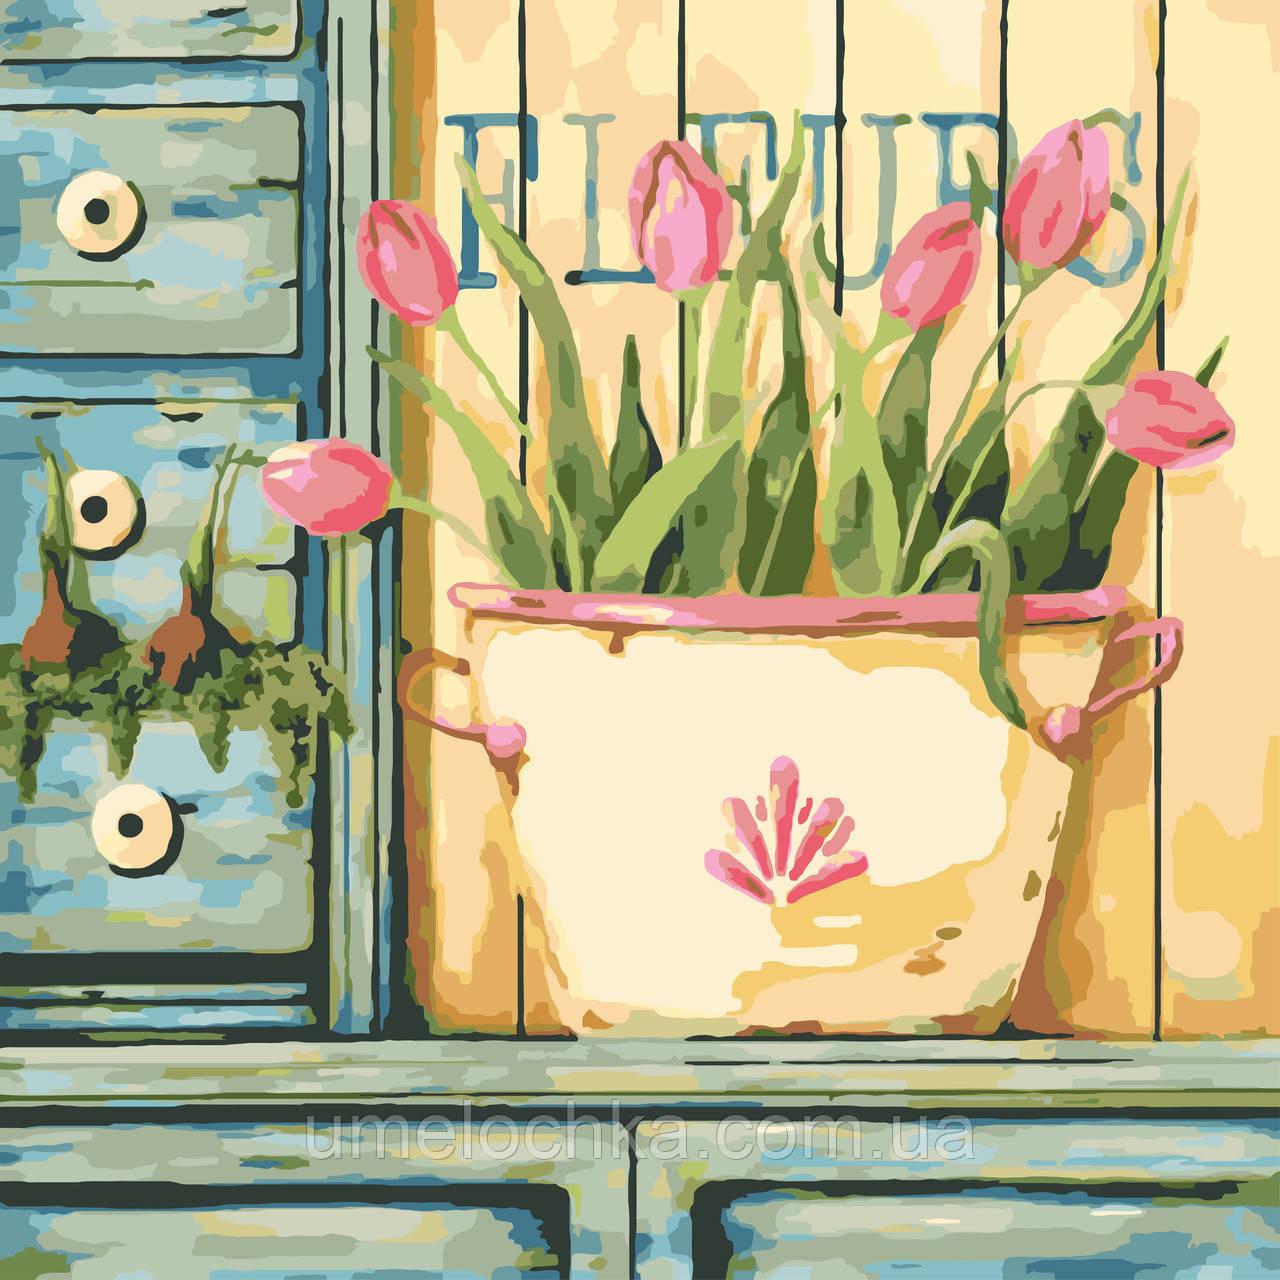 Картина по номерам на холсте без коробки Идейка Розовые тюльпаны (KHO2028) 40 х 40 см